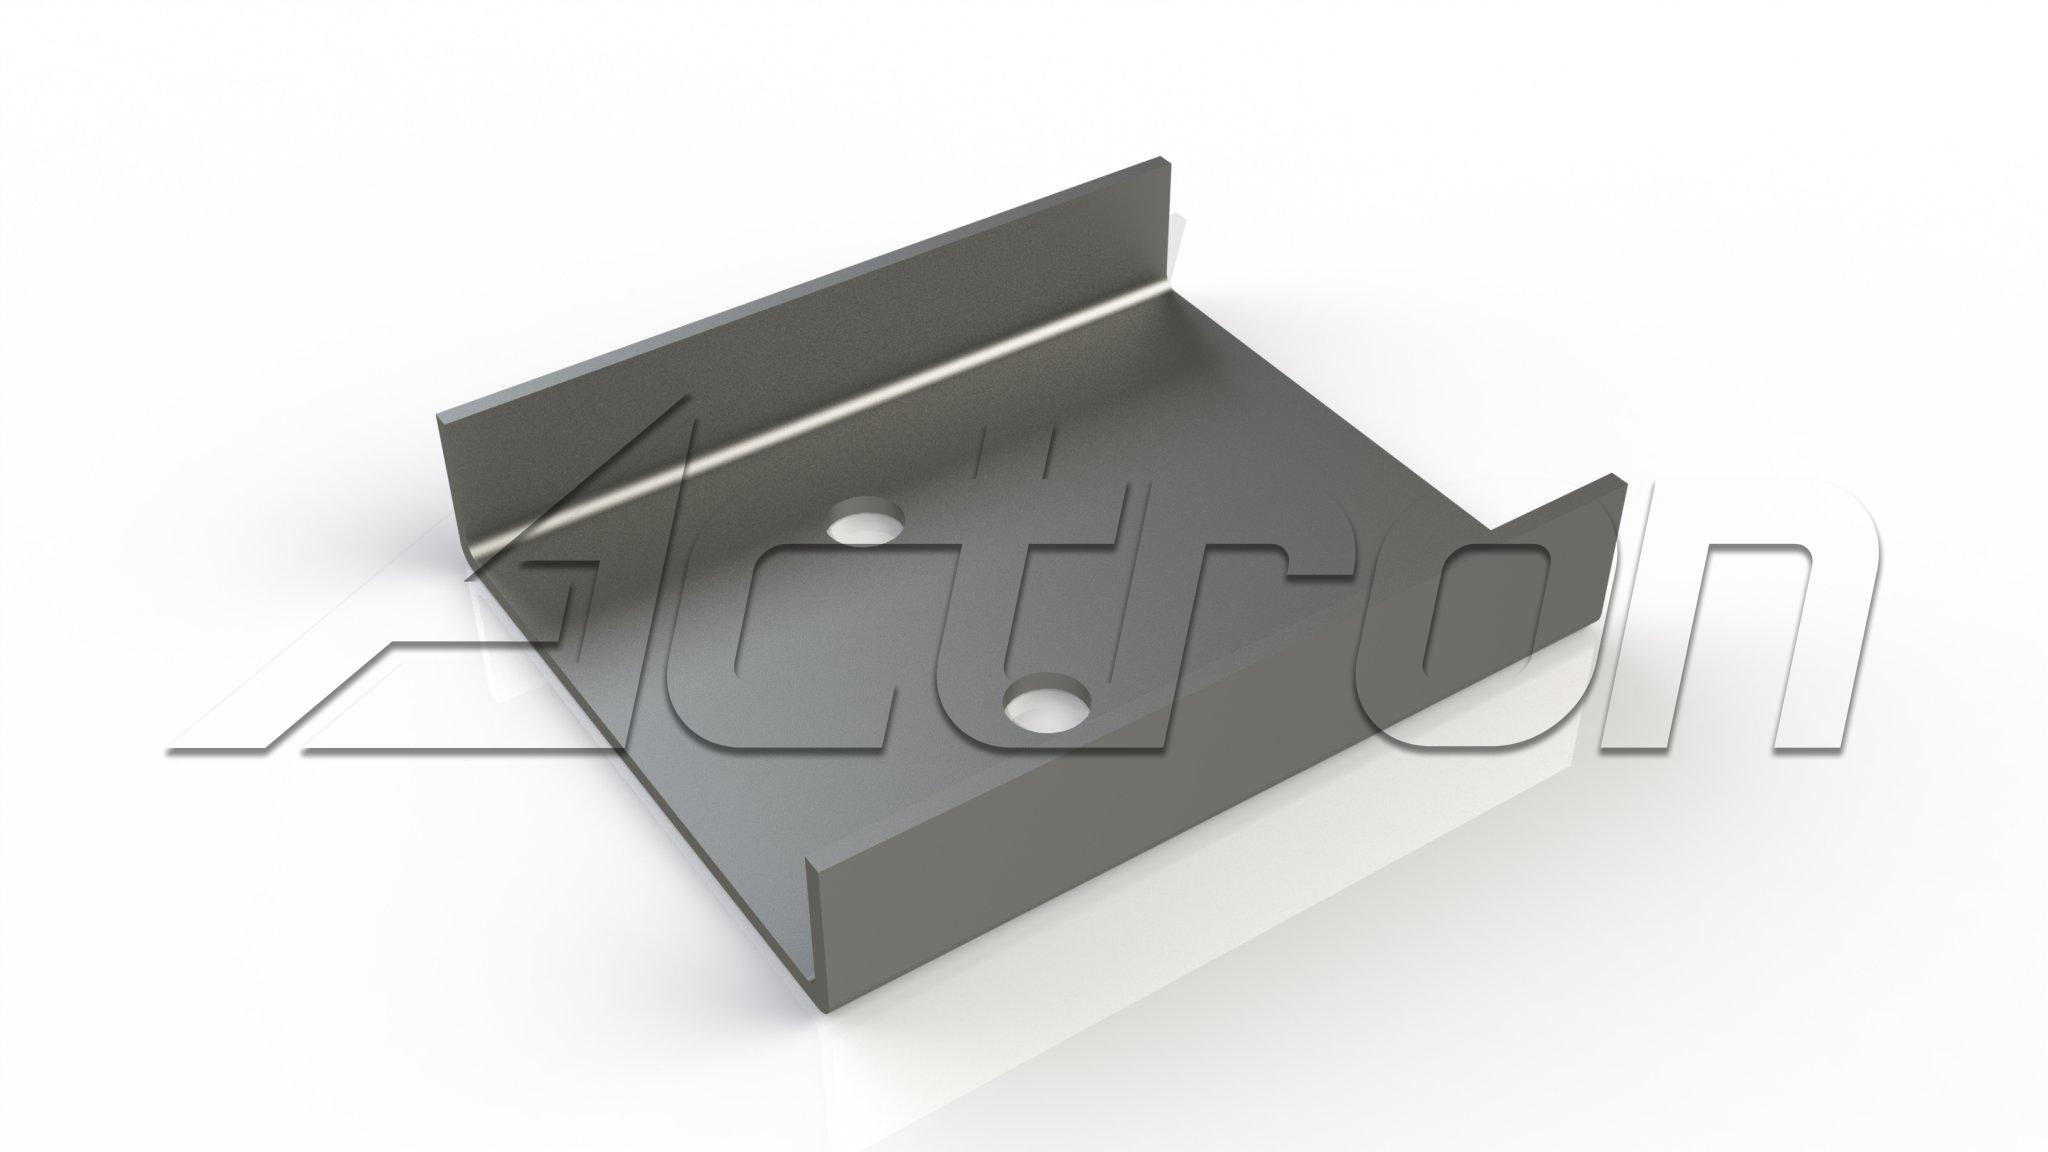 mounting-bracket-8211-latch-5268-a43024.jpg